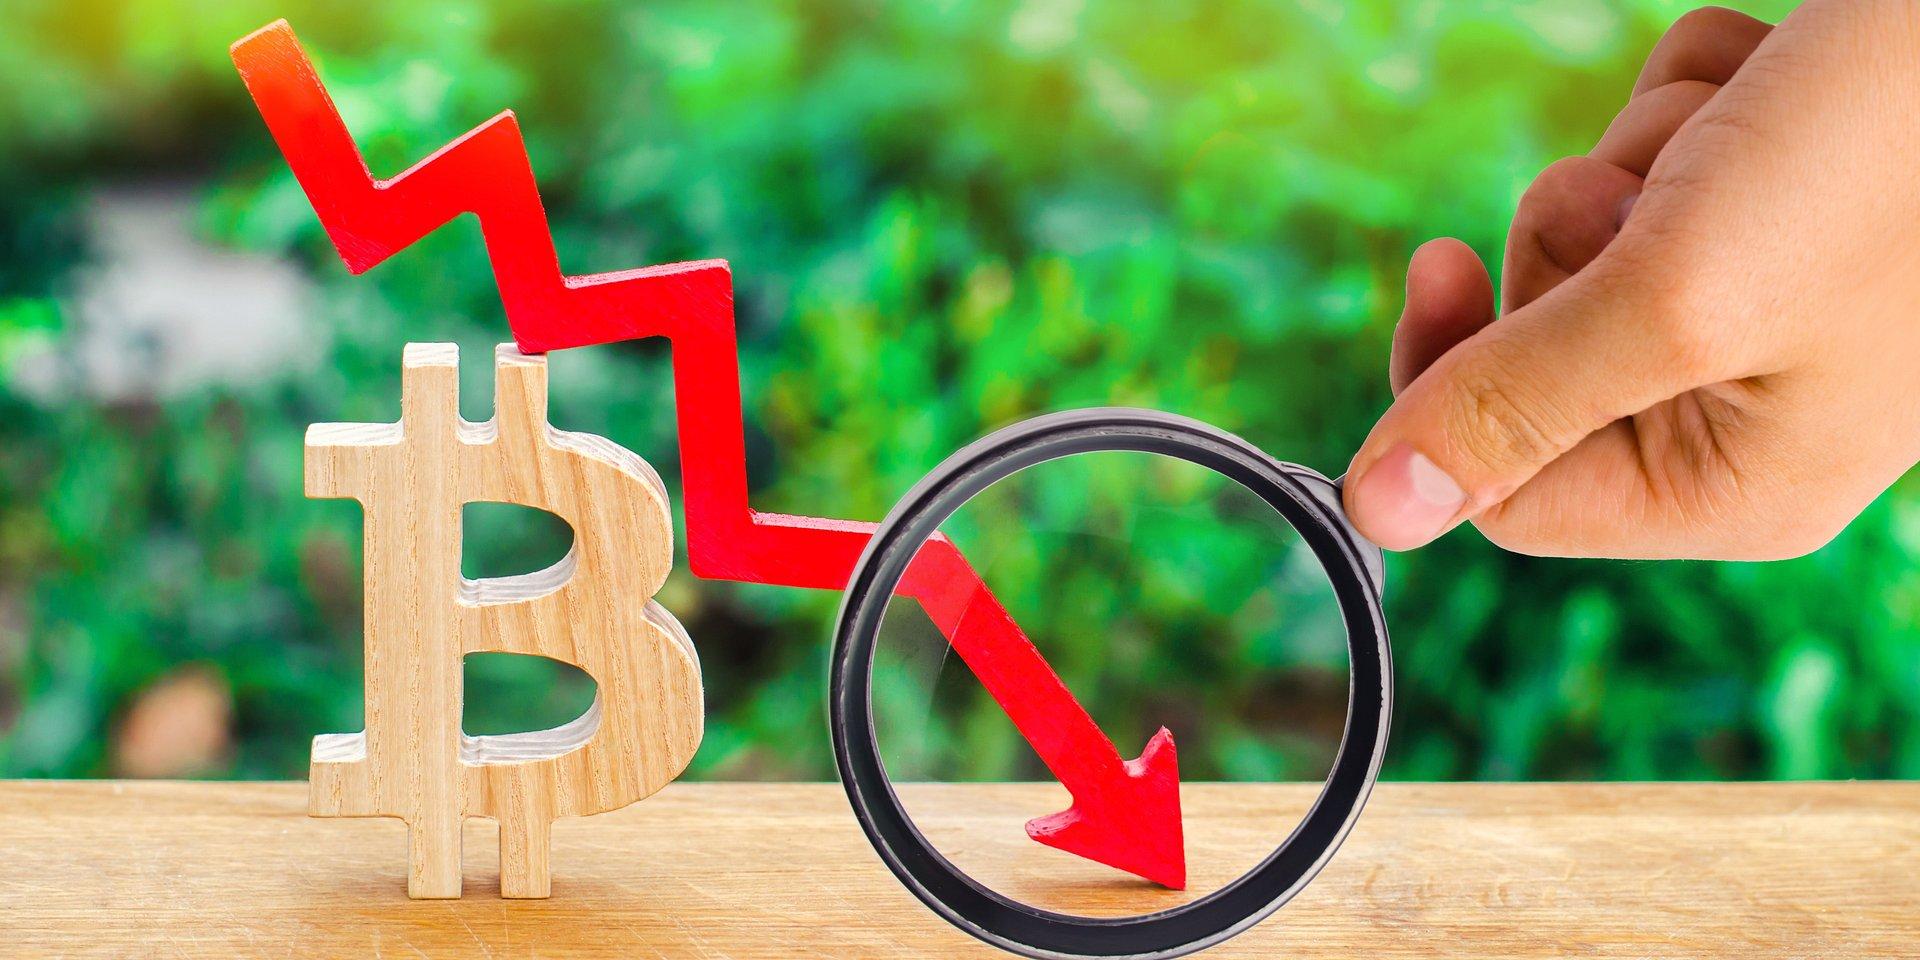 Market Behavior in Times of Bitcoin's Rough Slump